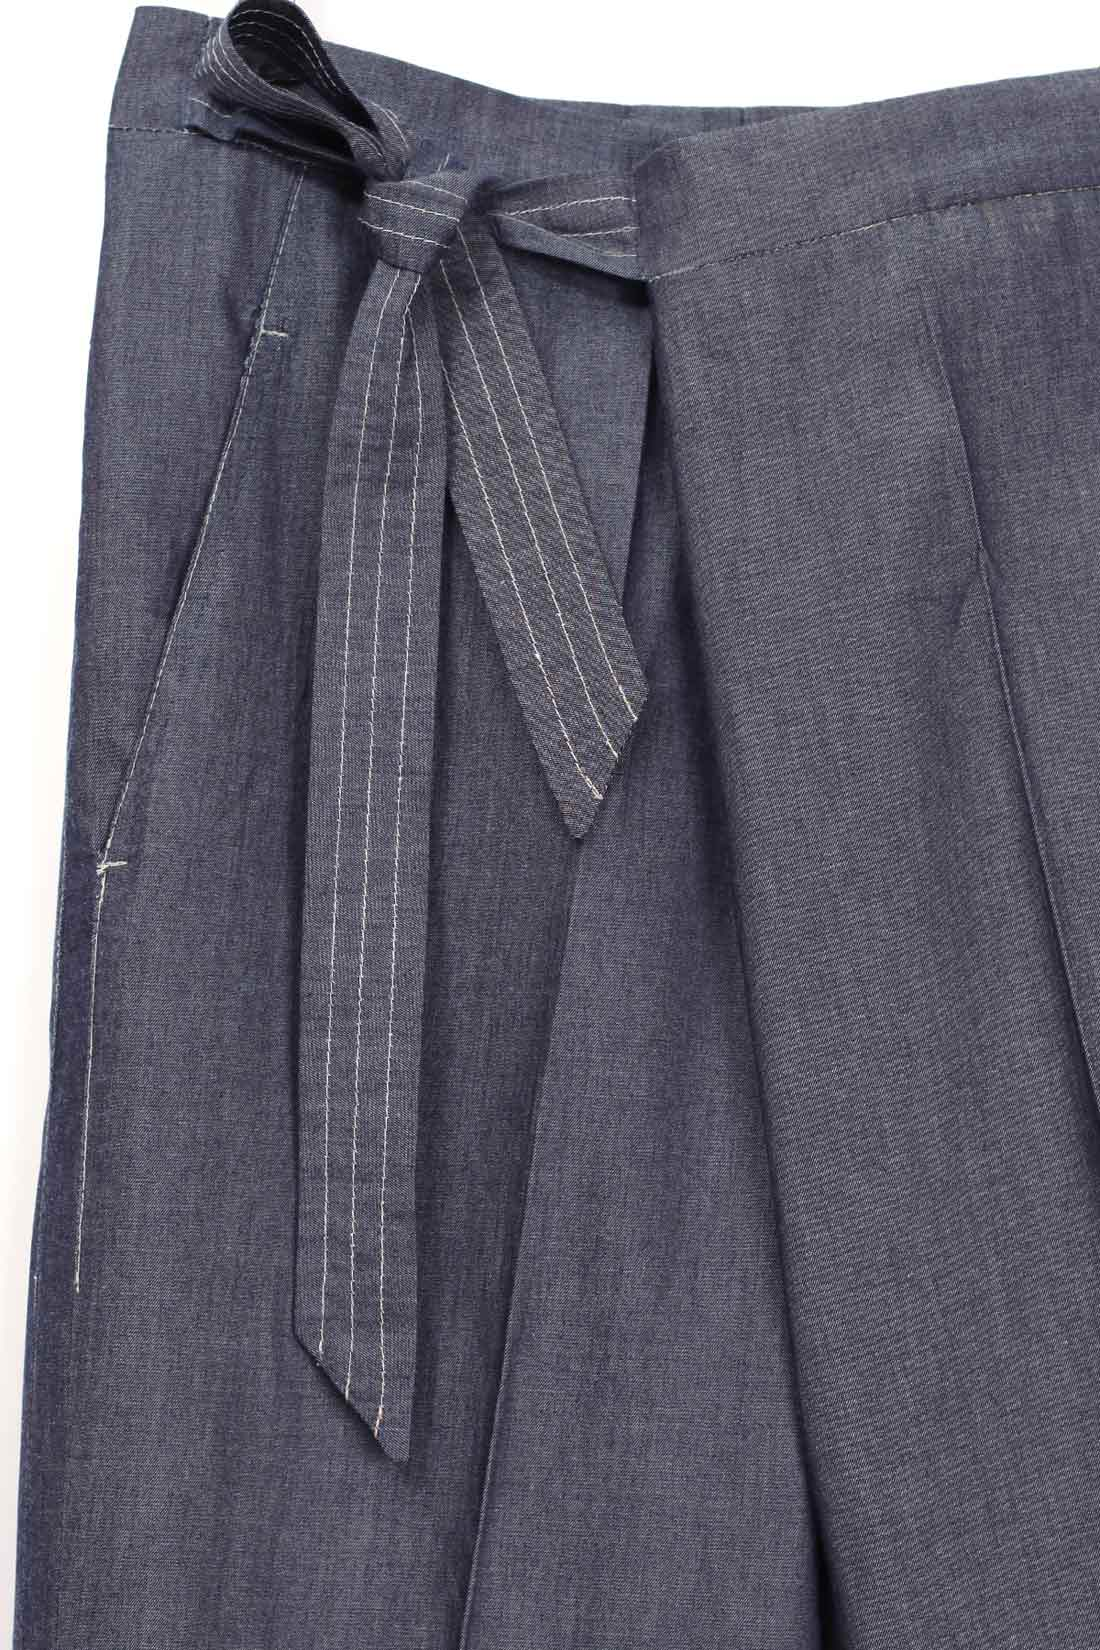 paula immich wickelhose aus leichtem Jeansstoff